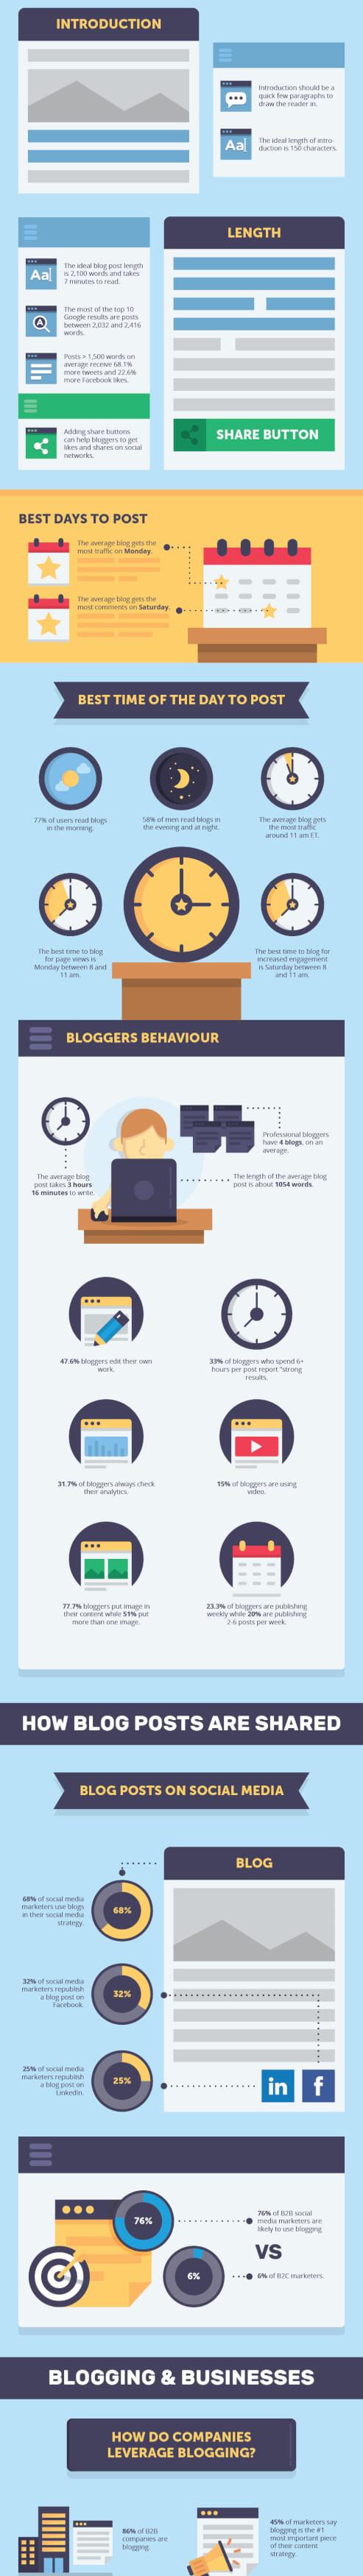 blogging-resources-infographic_04